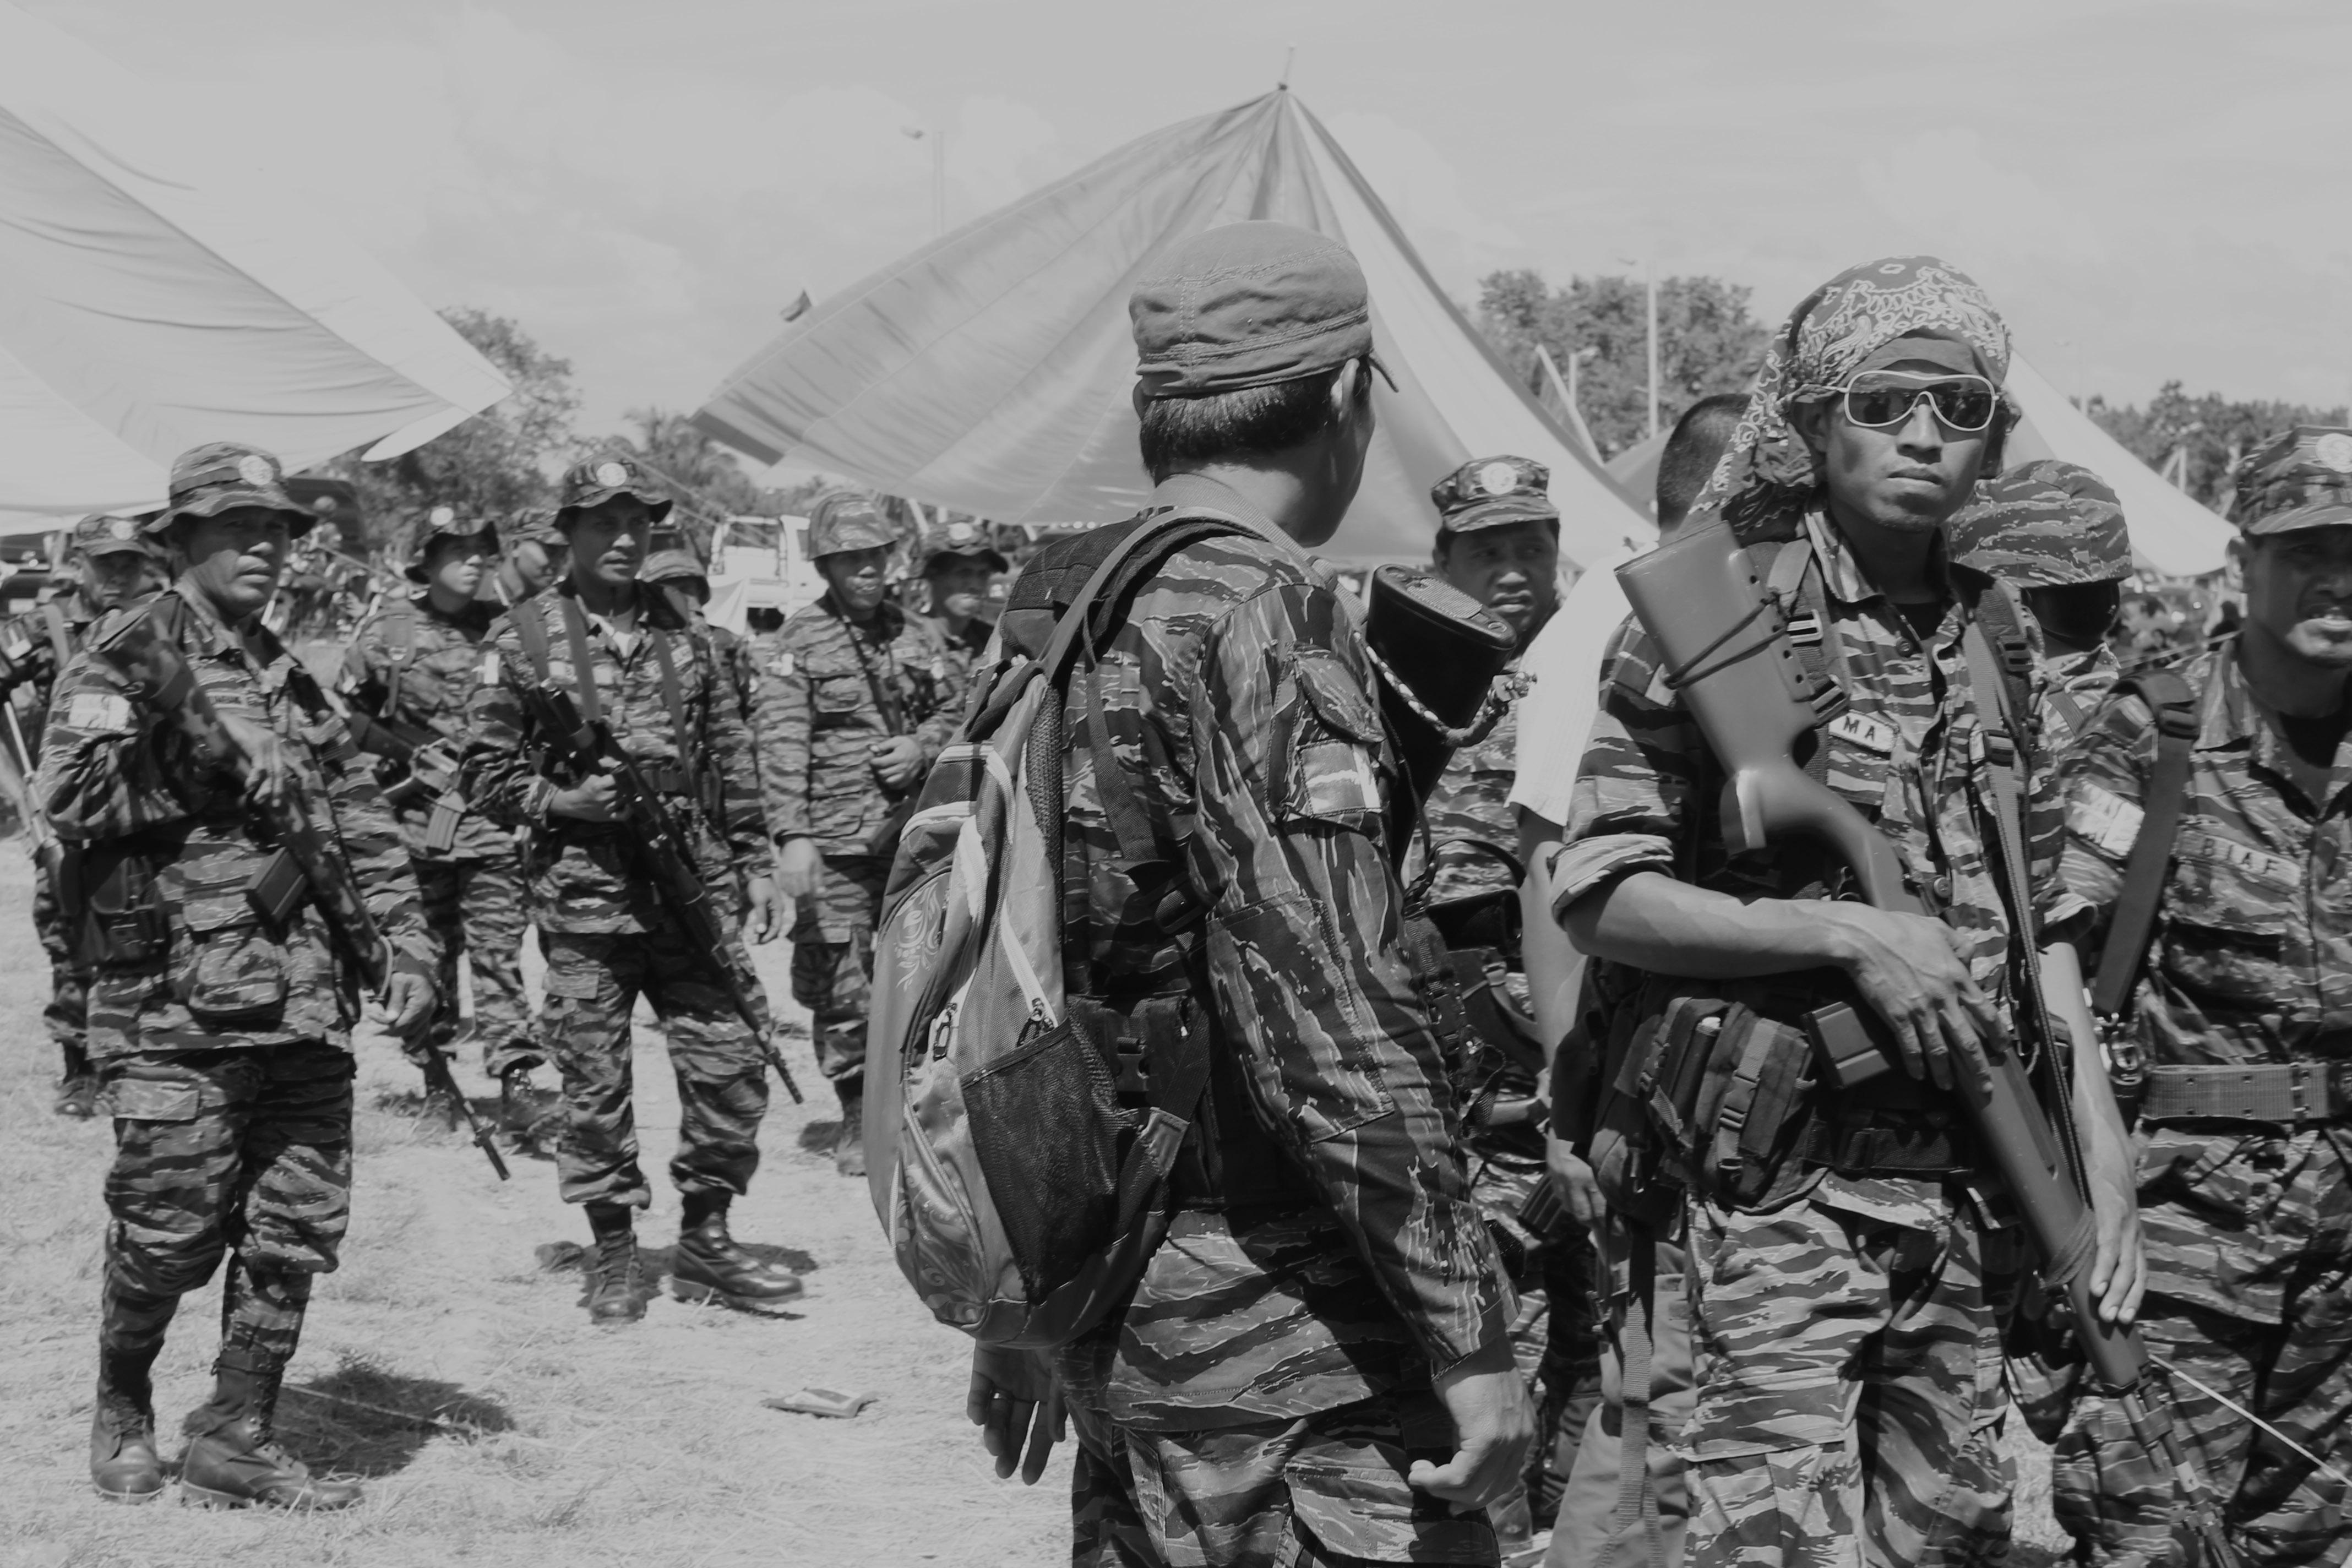 BIAF, Bangsamoro Islamic Armed Forces, MILF, Moro Islamic Liberation Front